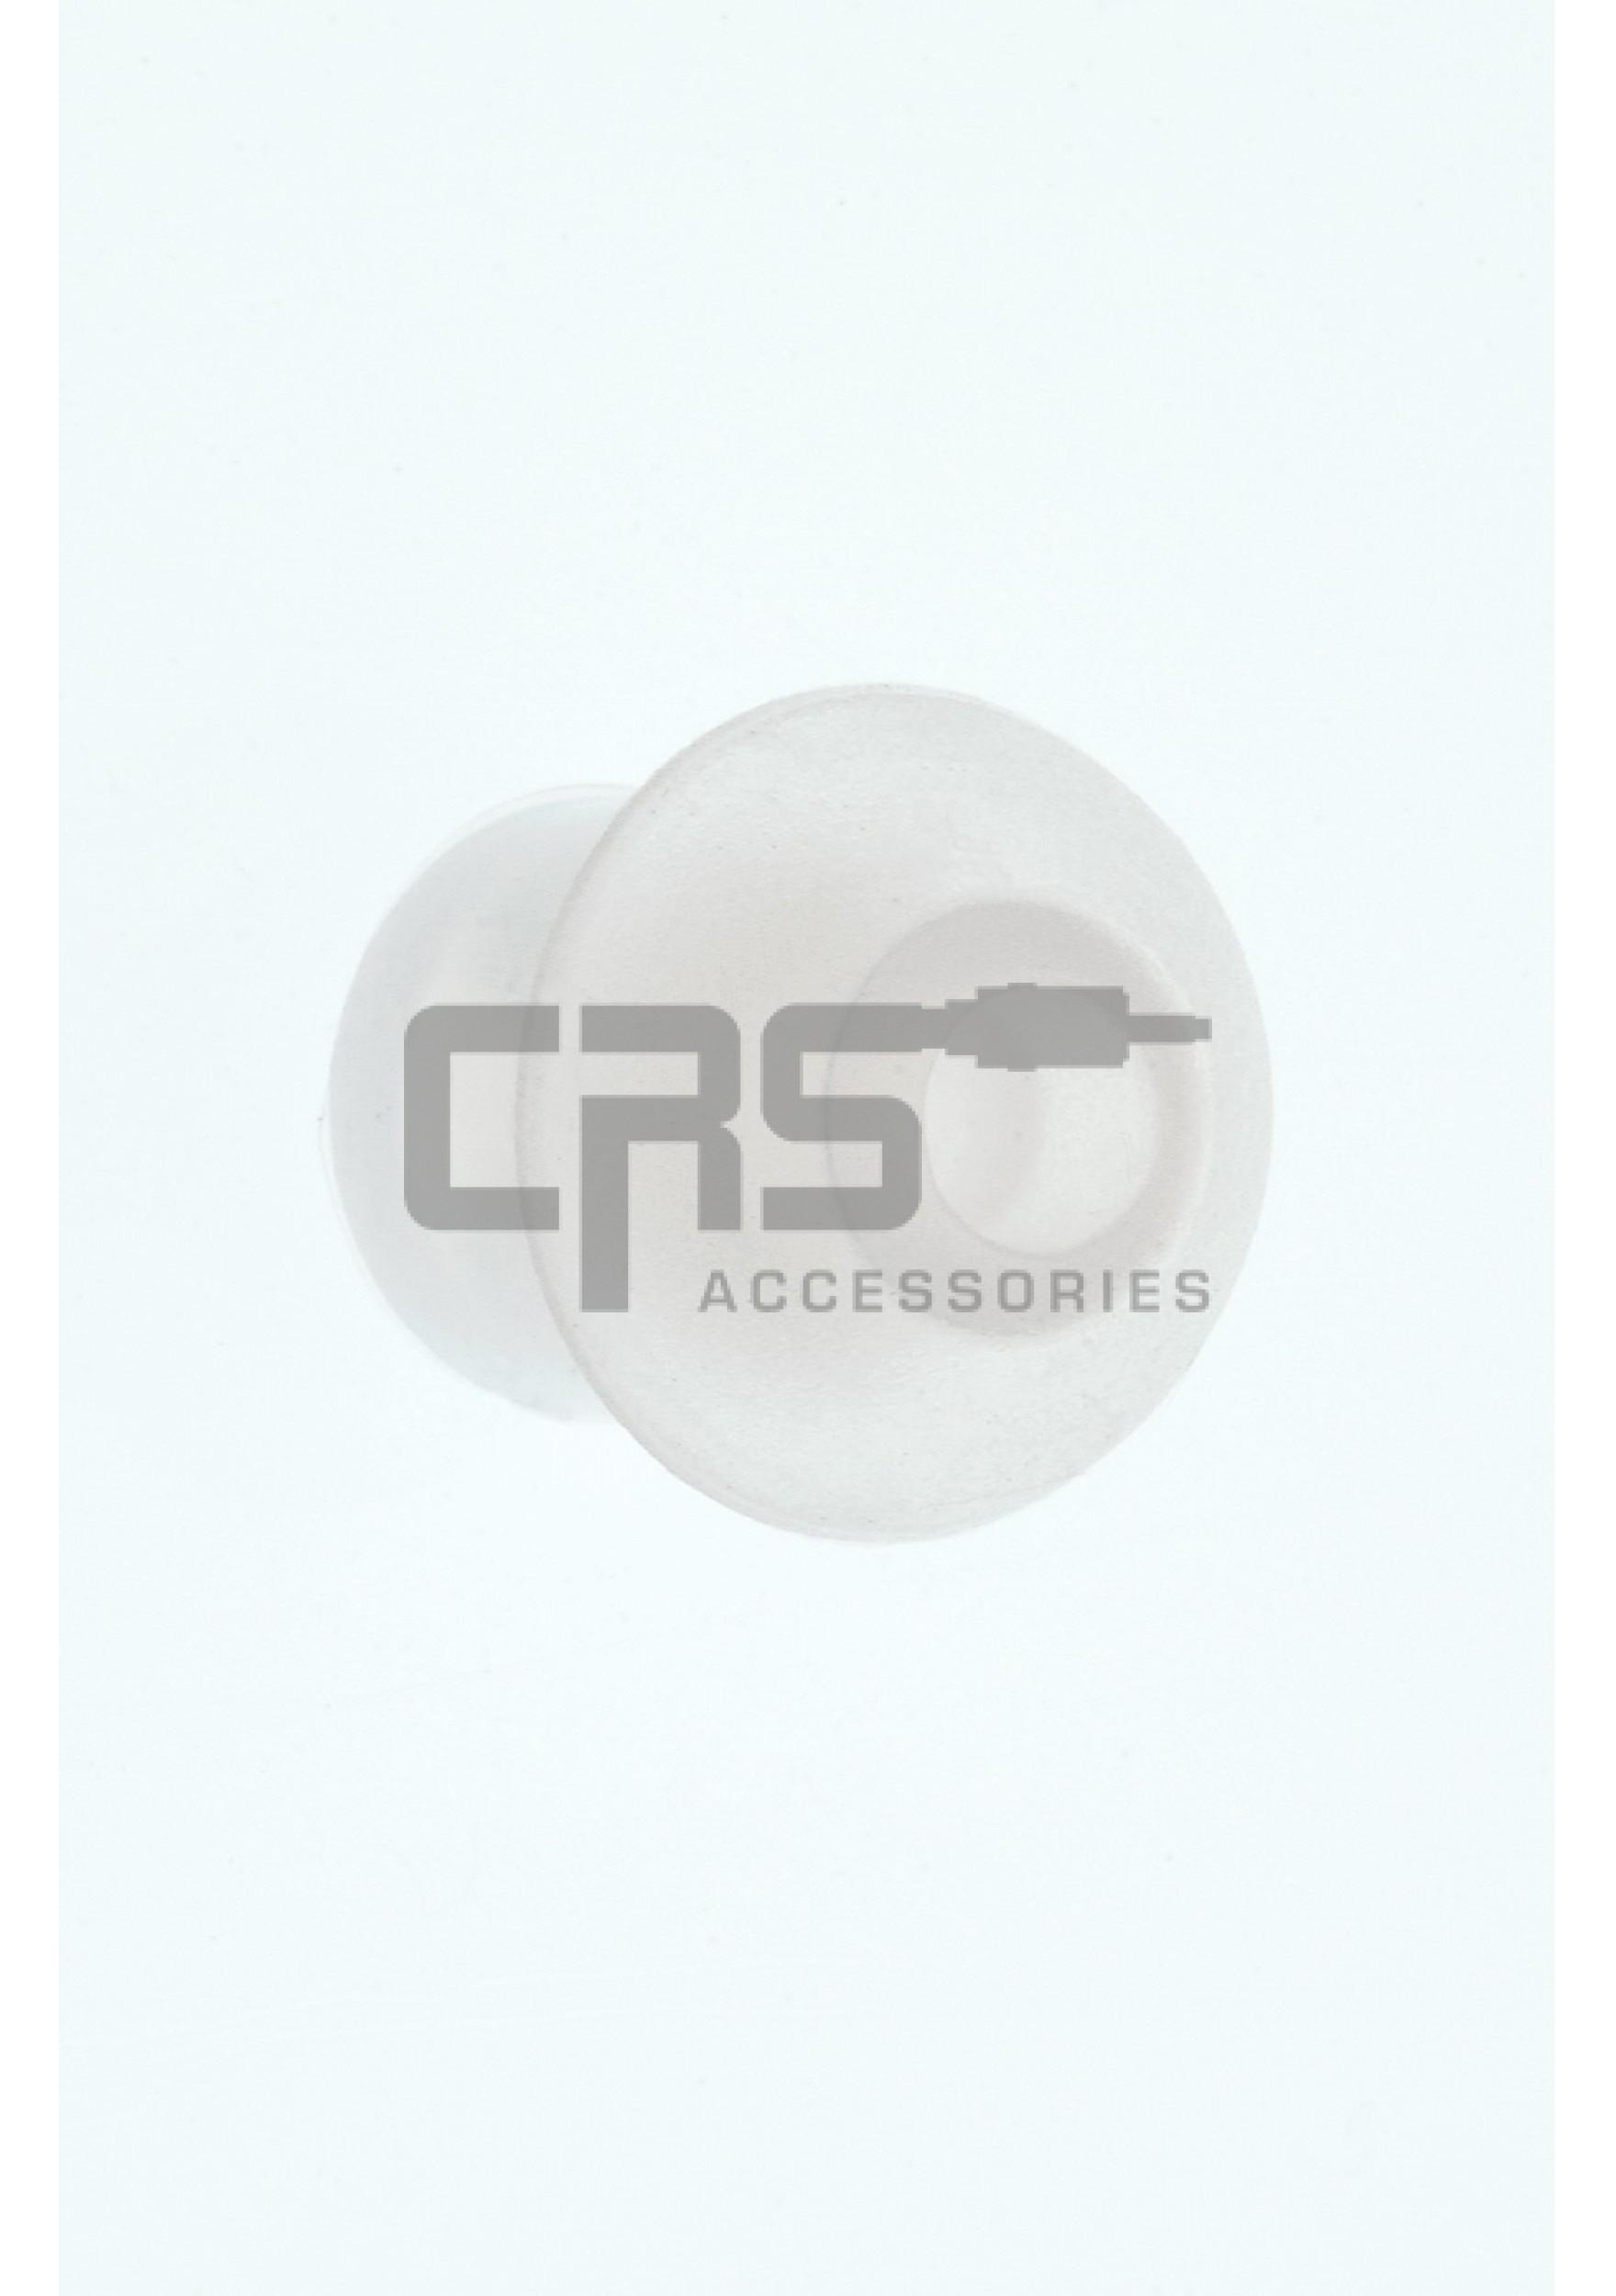 CRS Mushroom Eartip Suit CRS-1WSAT/MLAT/LAT, 2WSAT/MLAT/LAT, 3WSAT/MLAT/LAT